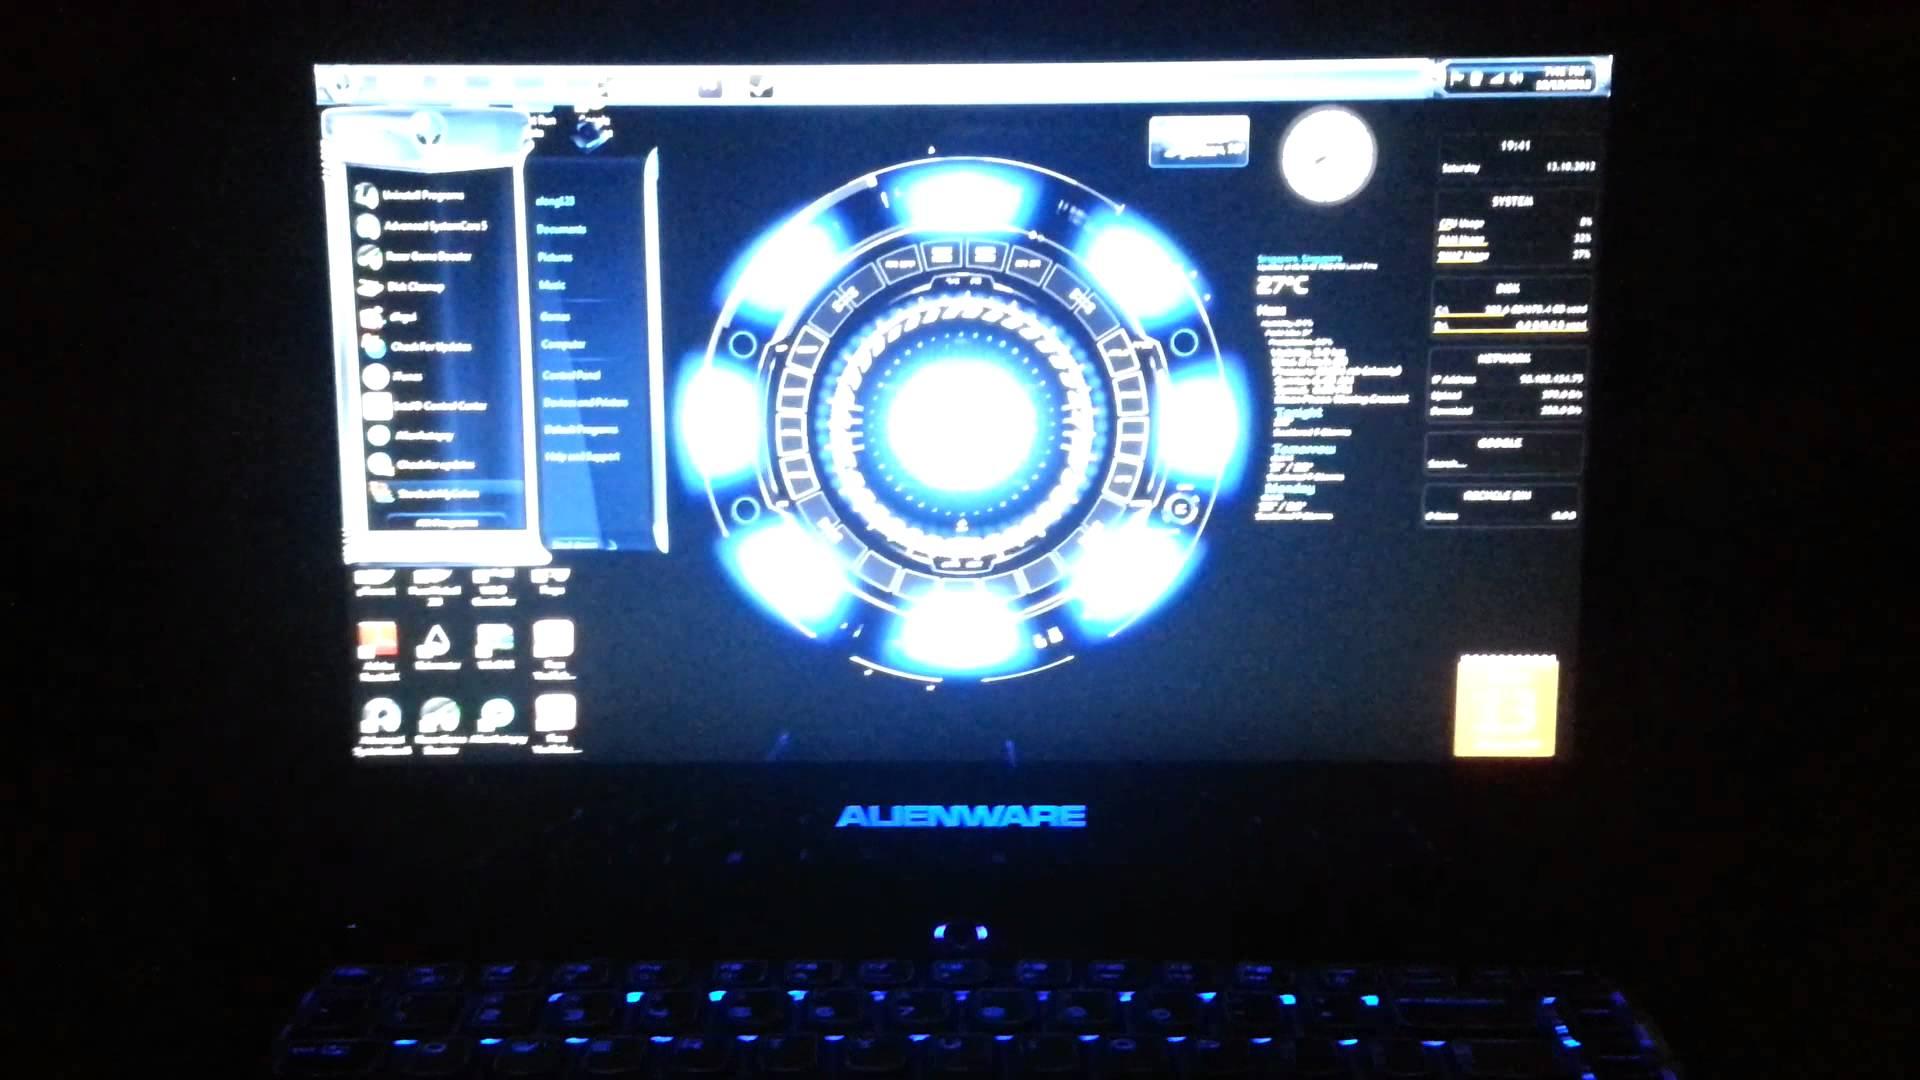 My Alienware laptop m14x R1 live desktop wallpaper 1920x1080